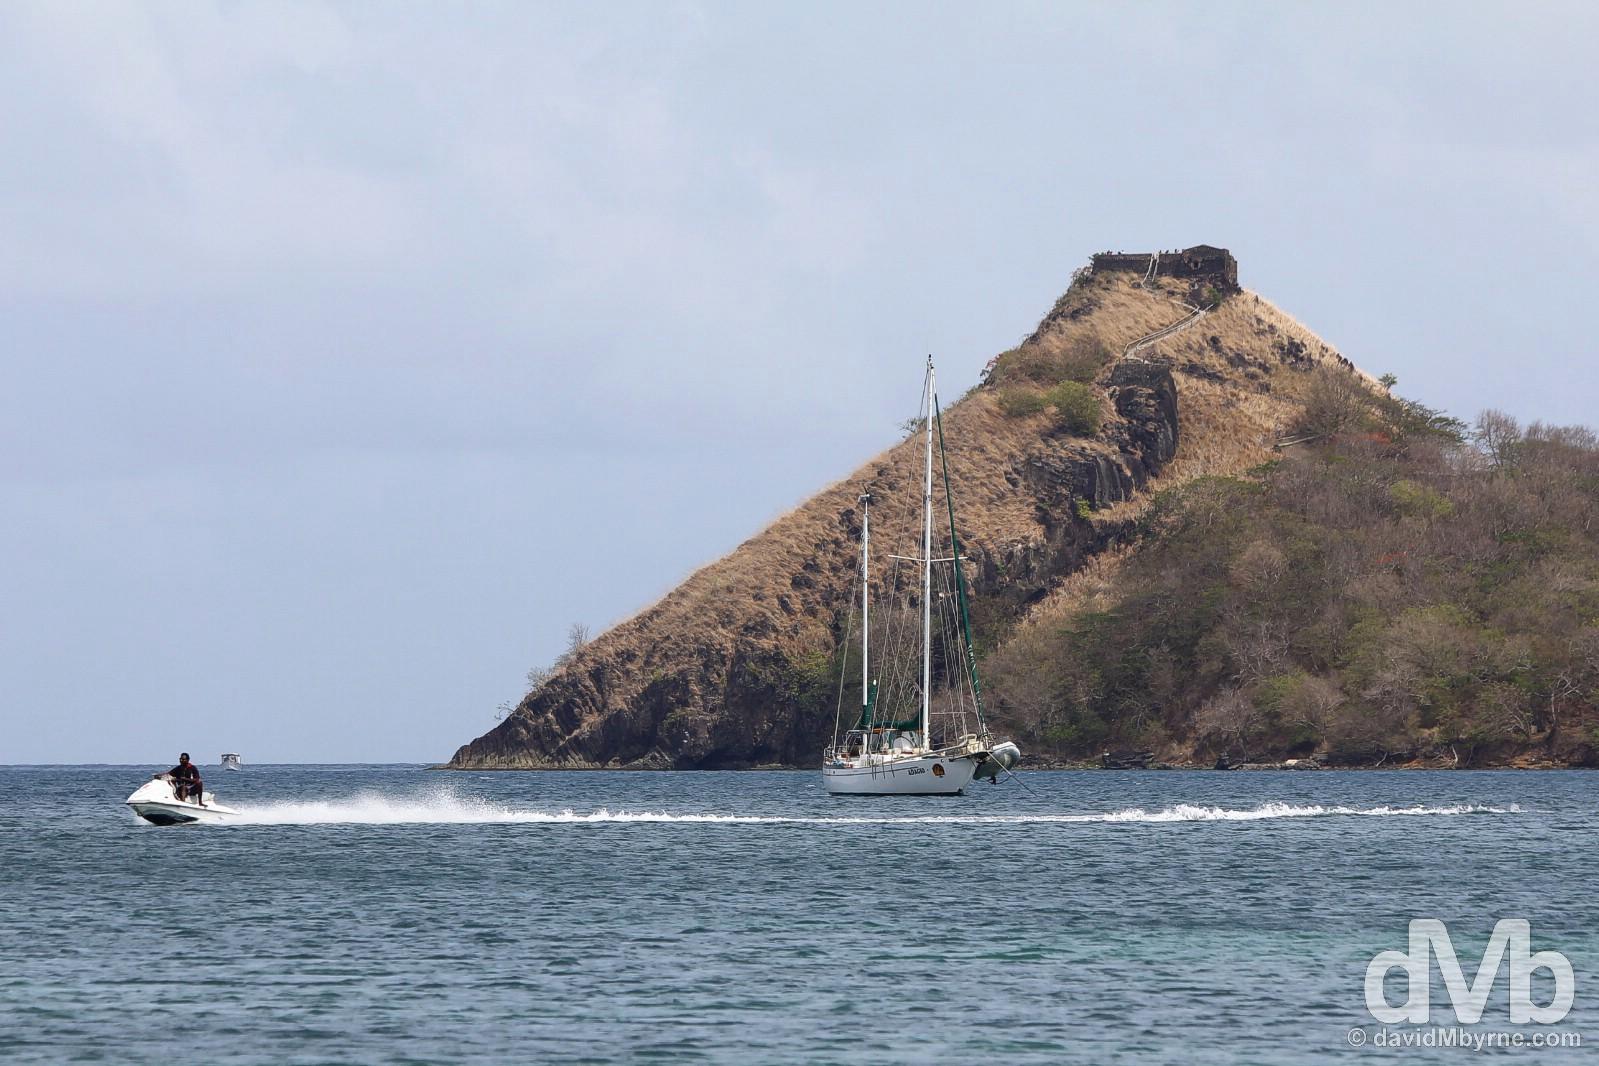 Rodney Bay, St. Lucia, Lesser Antilles. June 16, 2015.